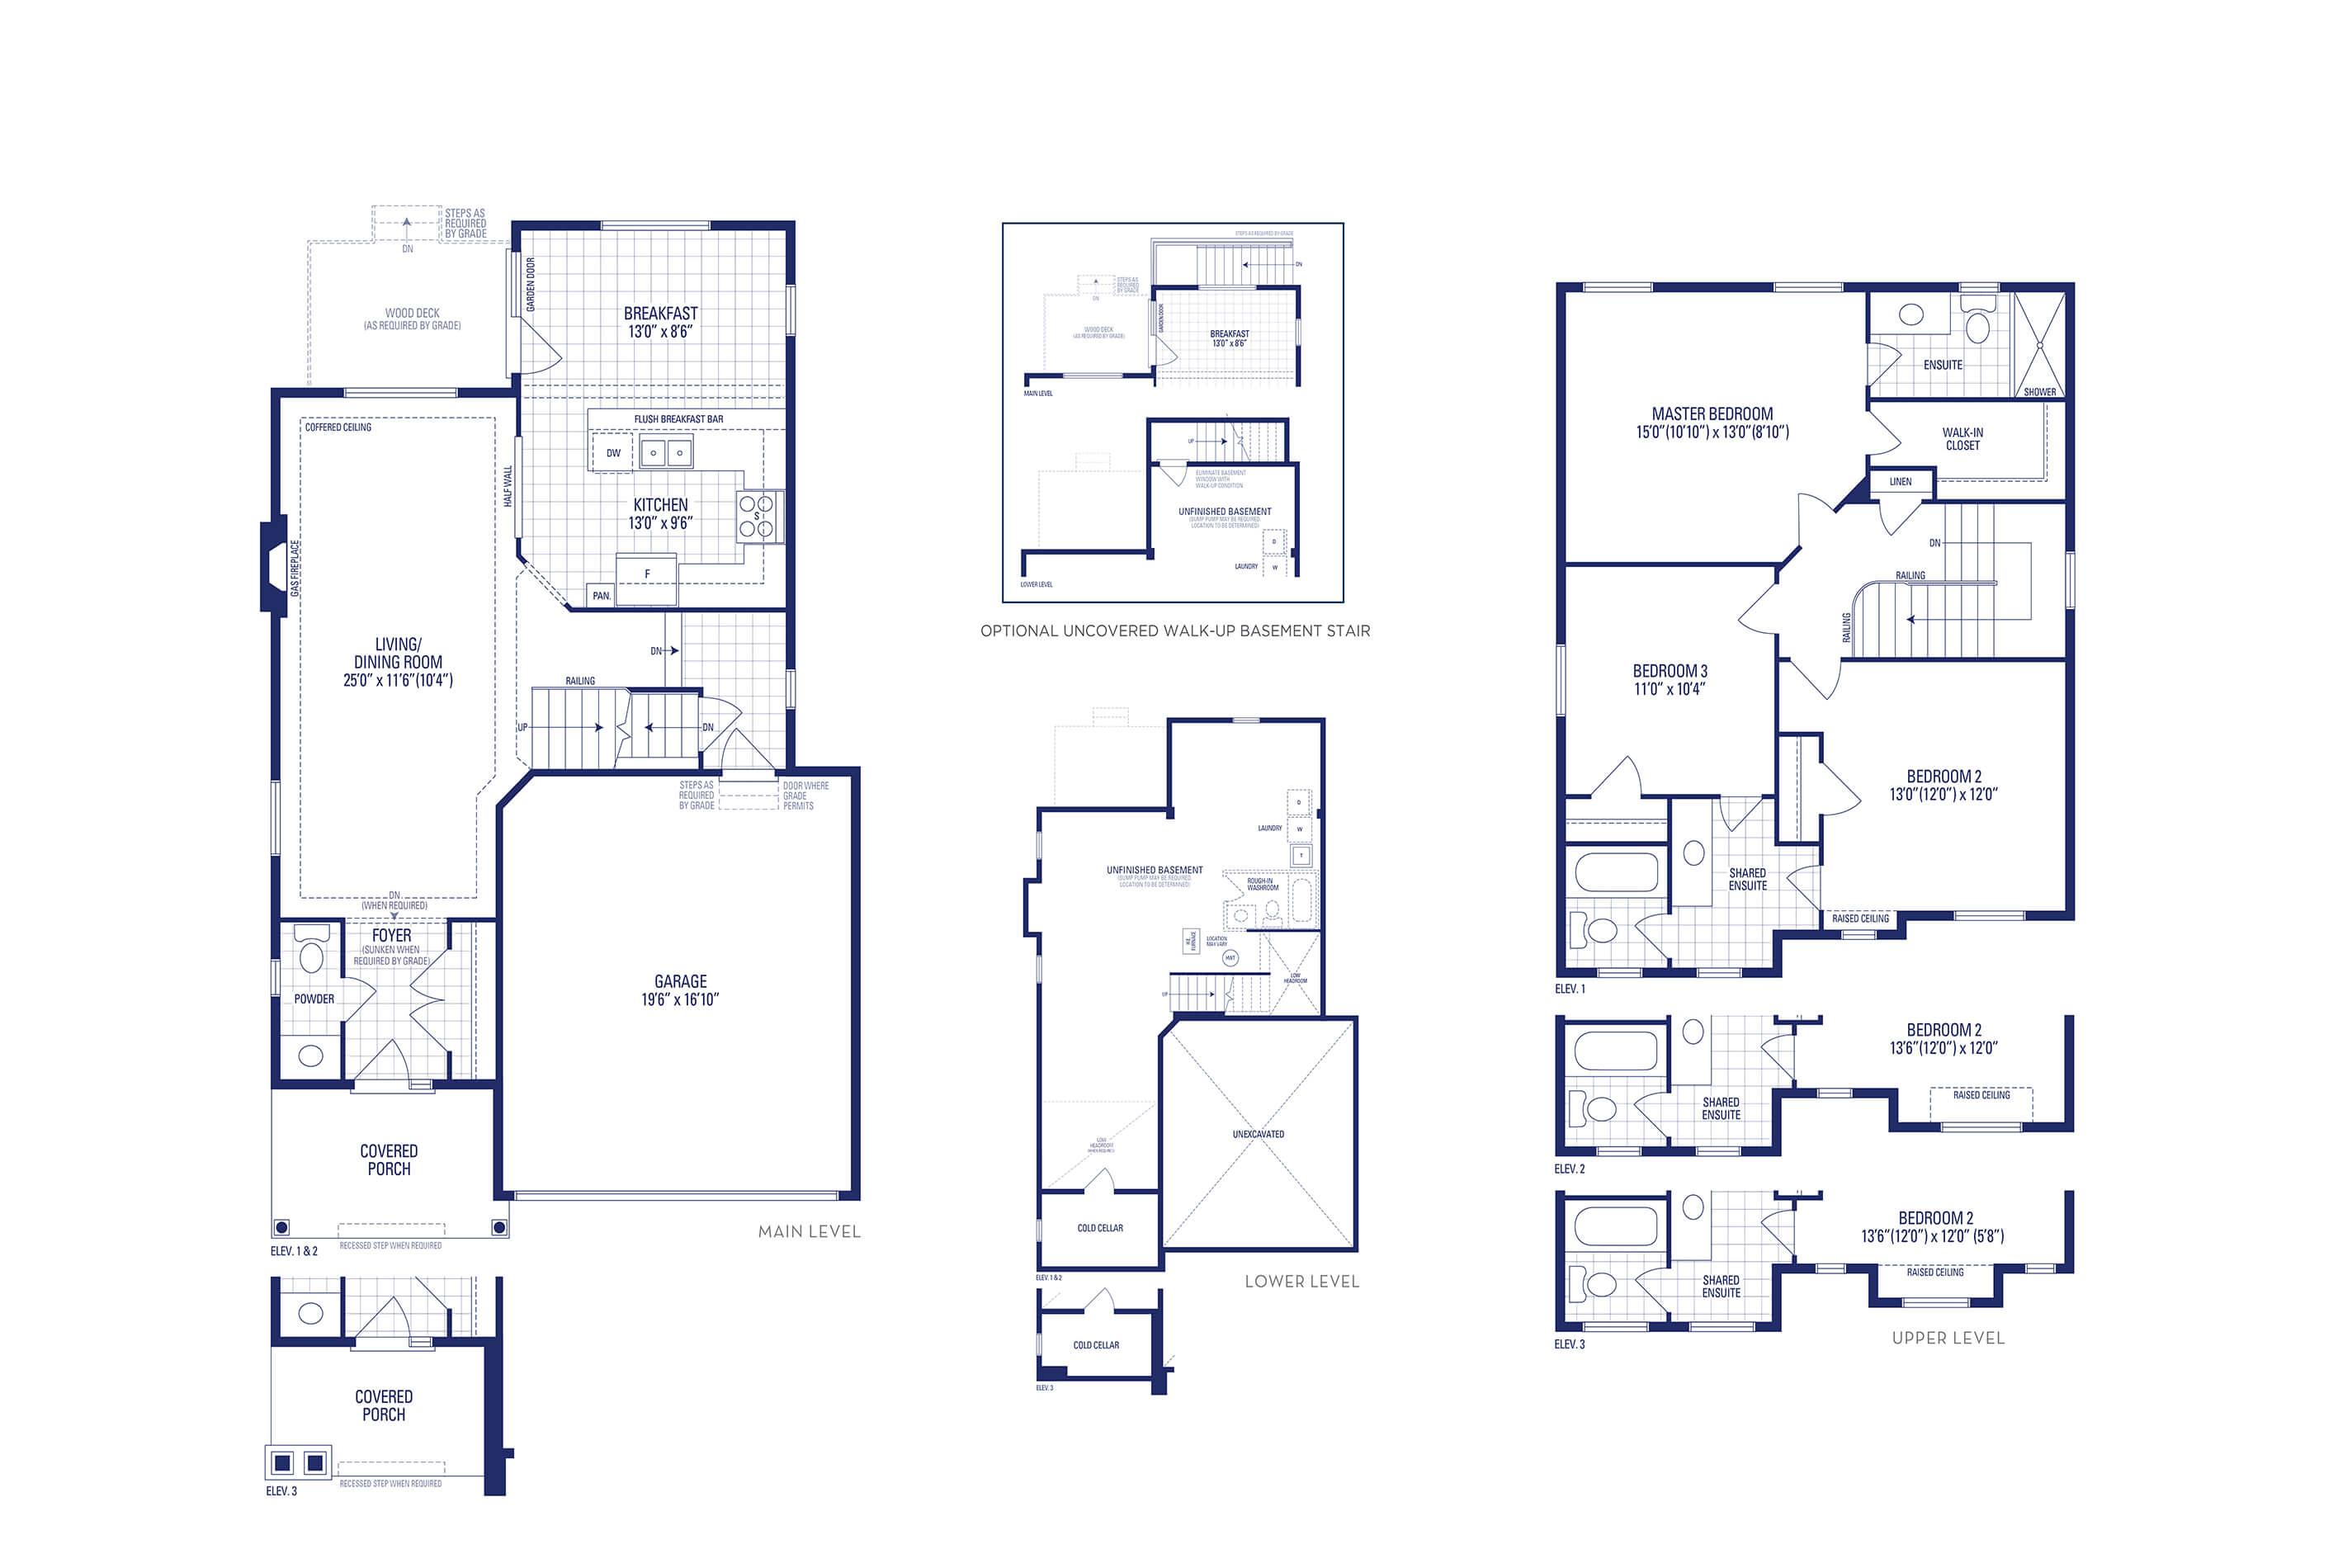 Jersey 01 Elev. 1 Floorplan Thumbnail